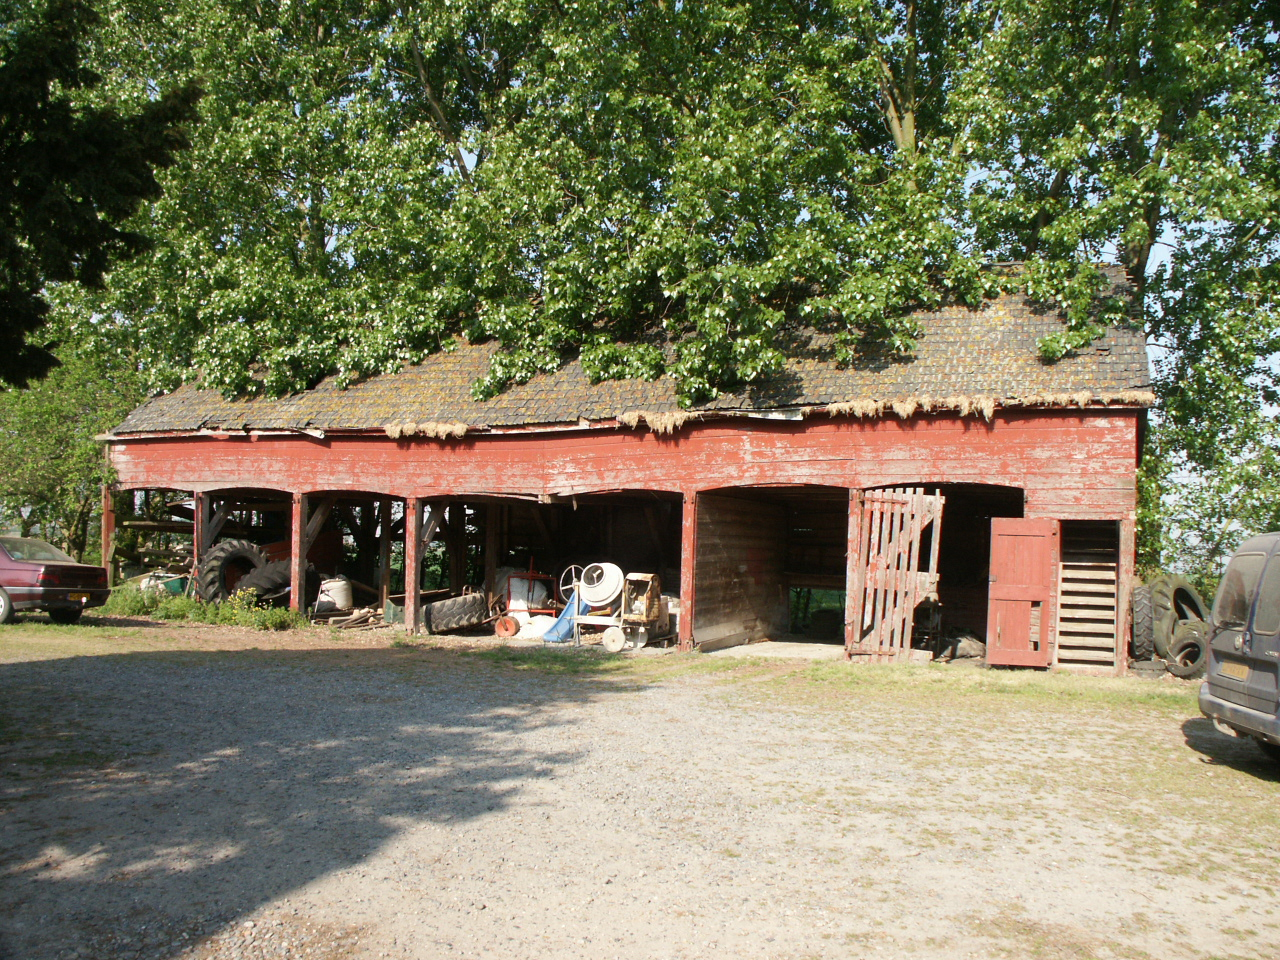 Agrarisch erfgoed